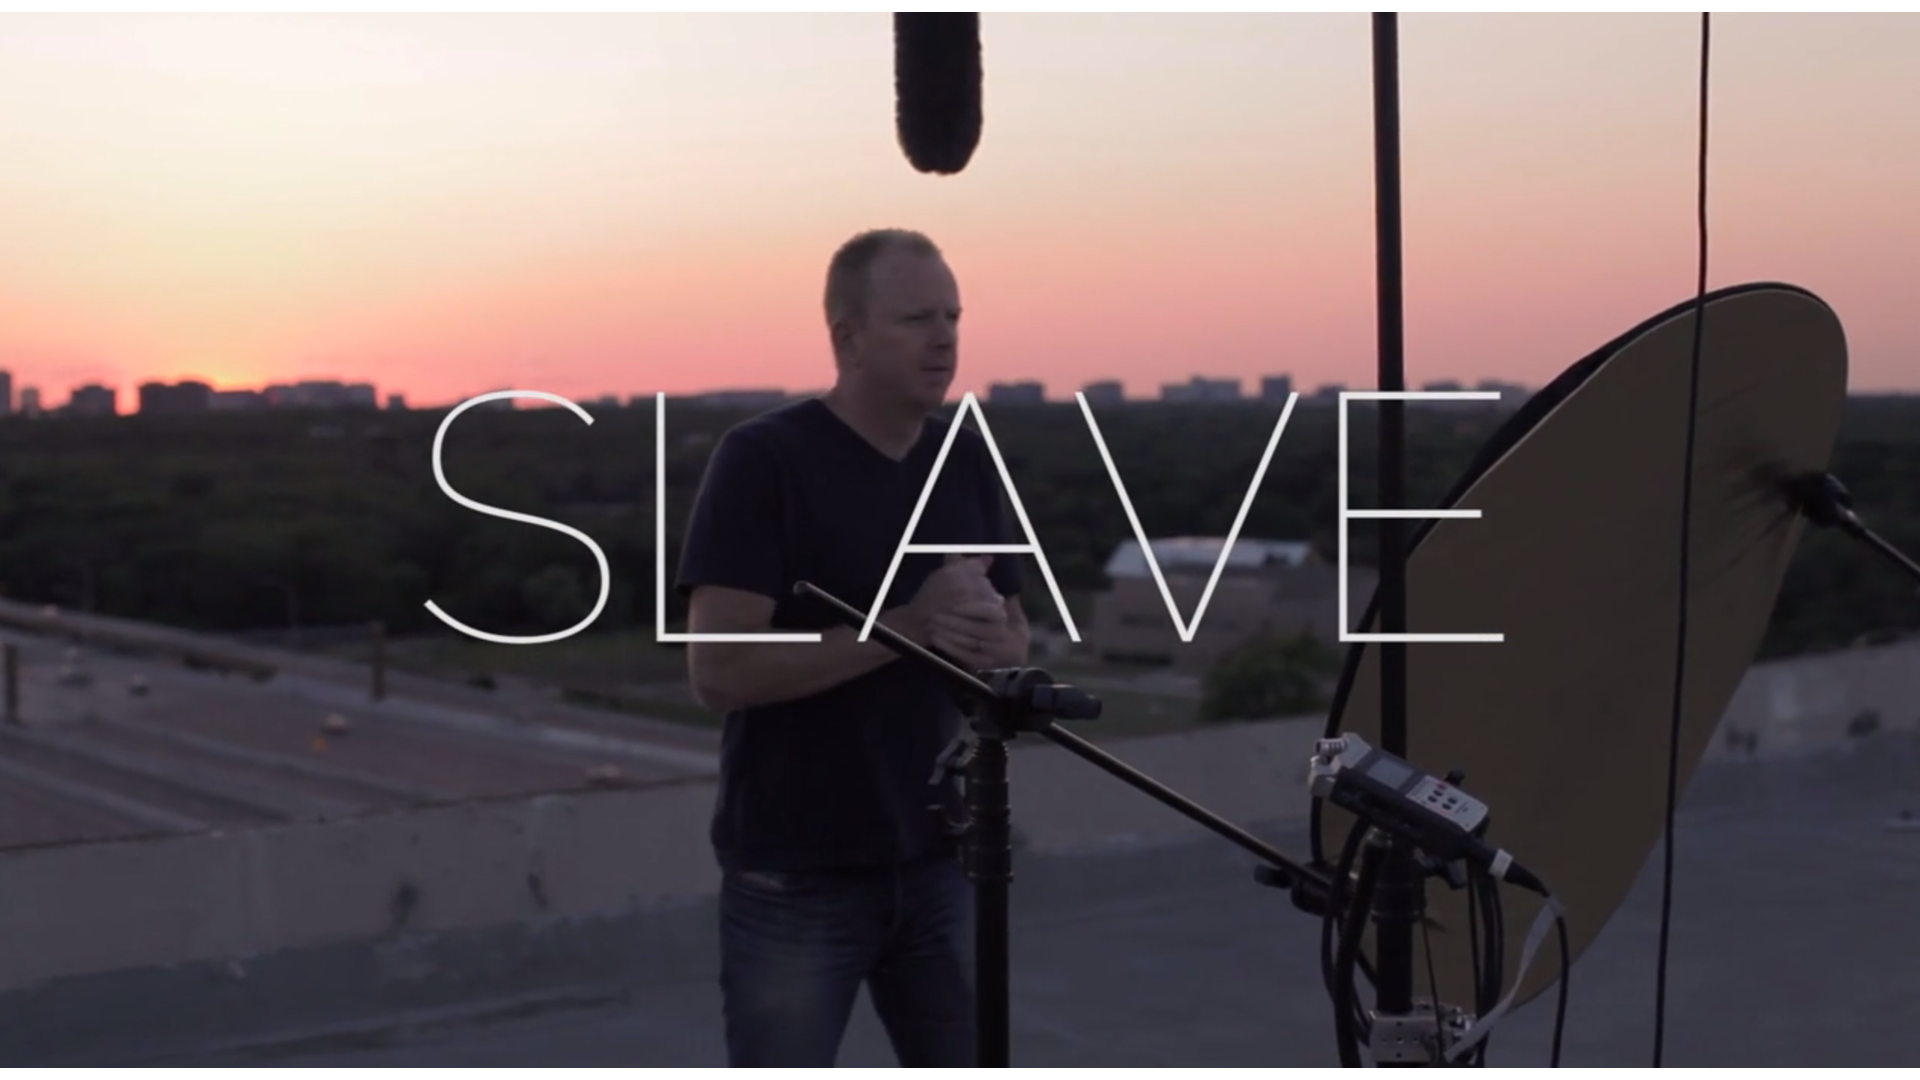 Slave. Hero Image